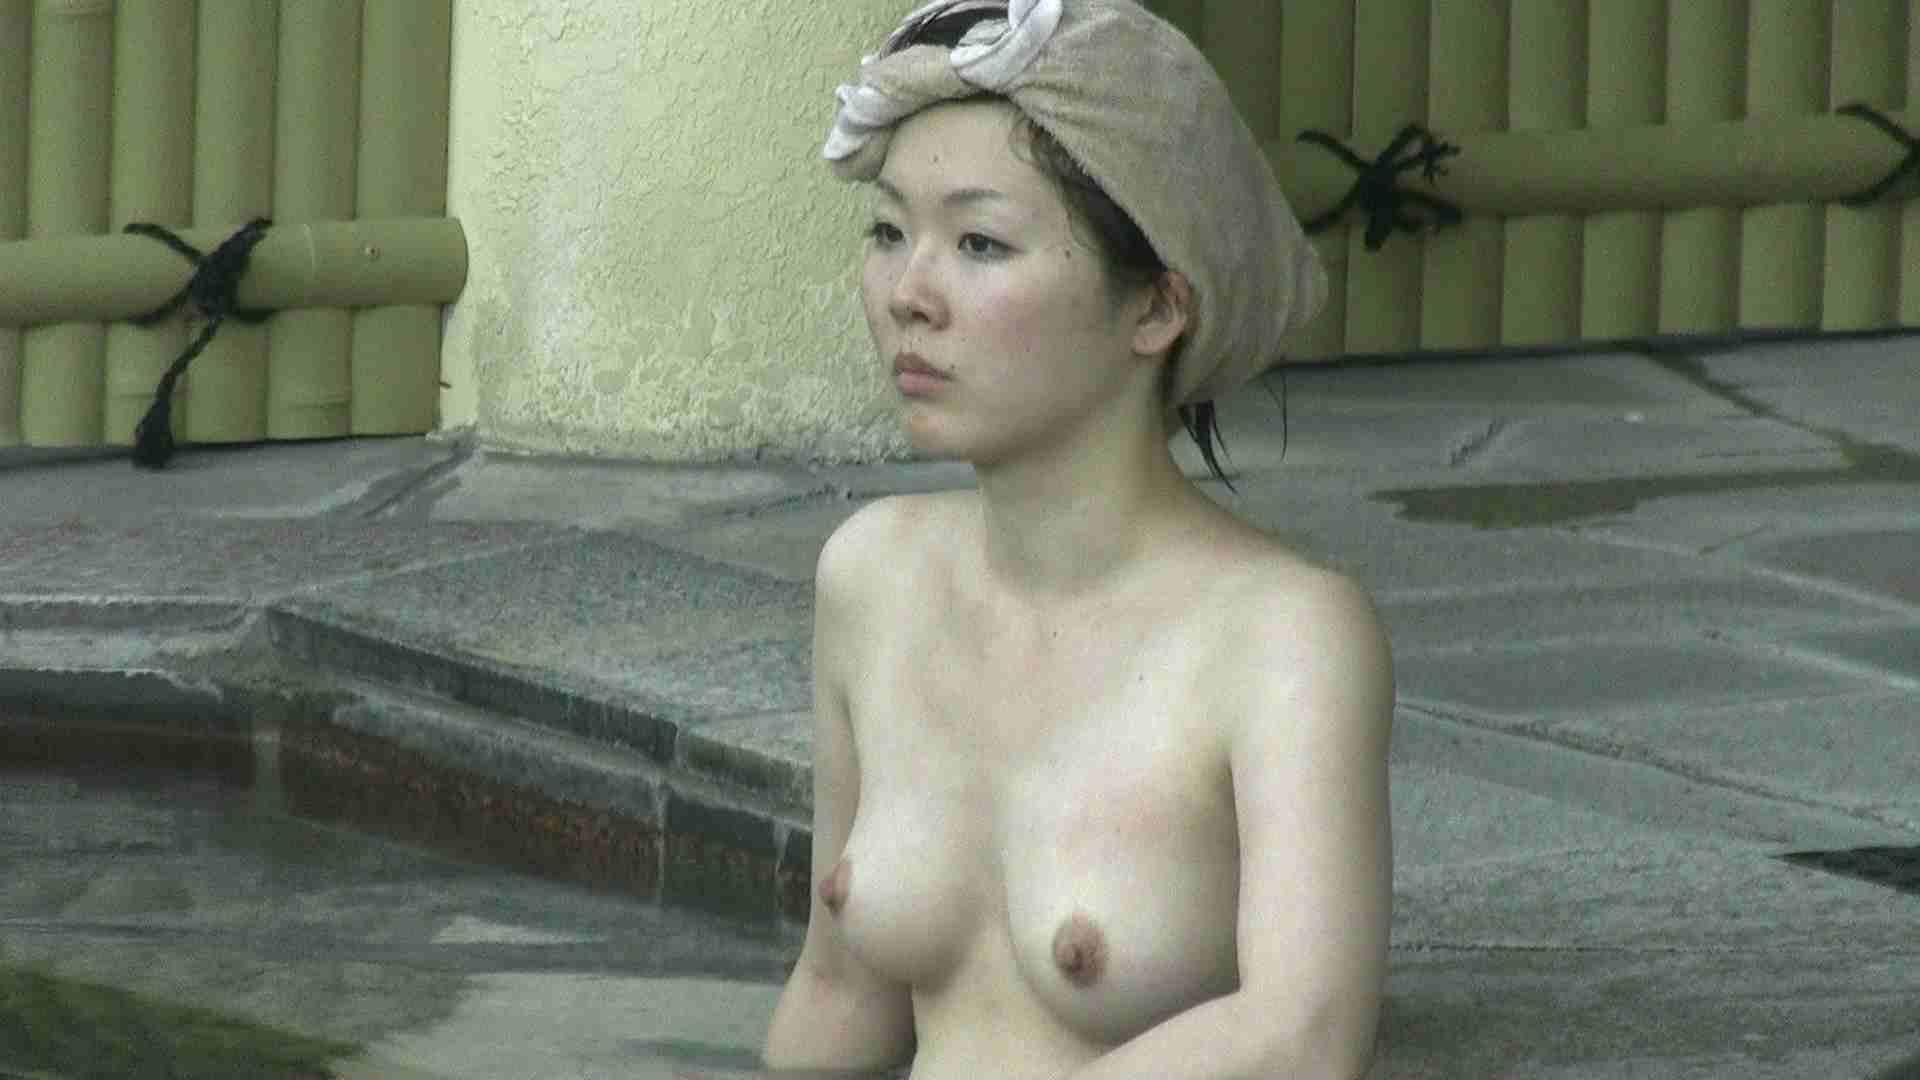 Aquaな露天風呂Vol.191 HなOL | 露天  65pic 41